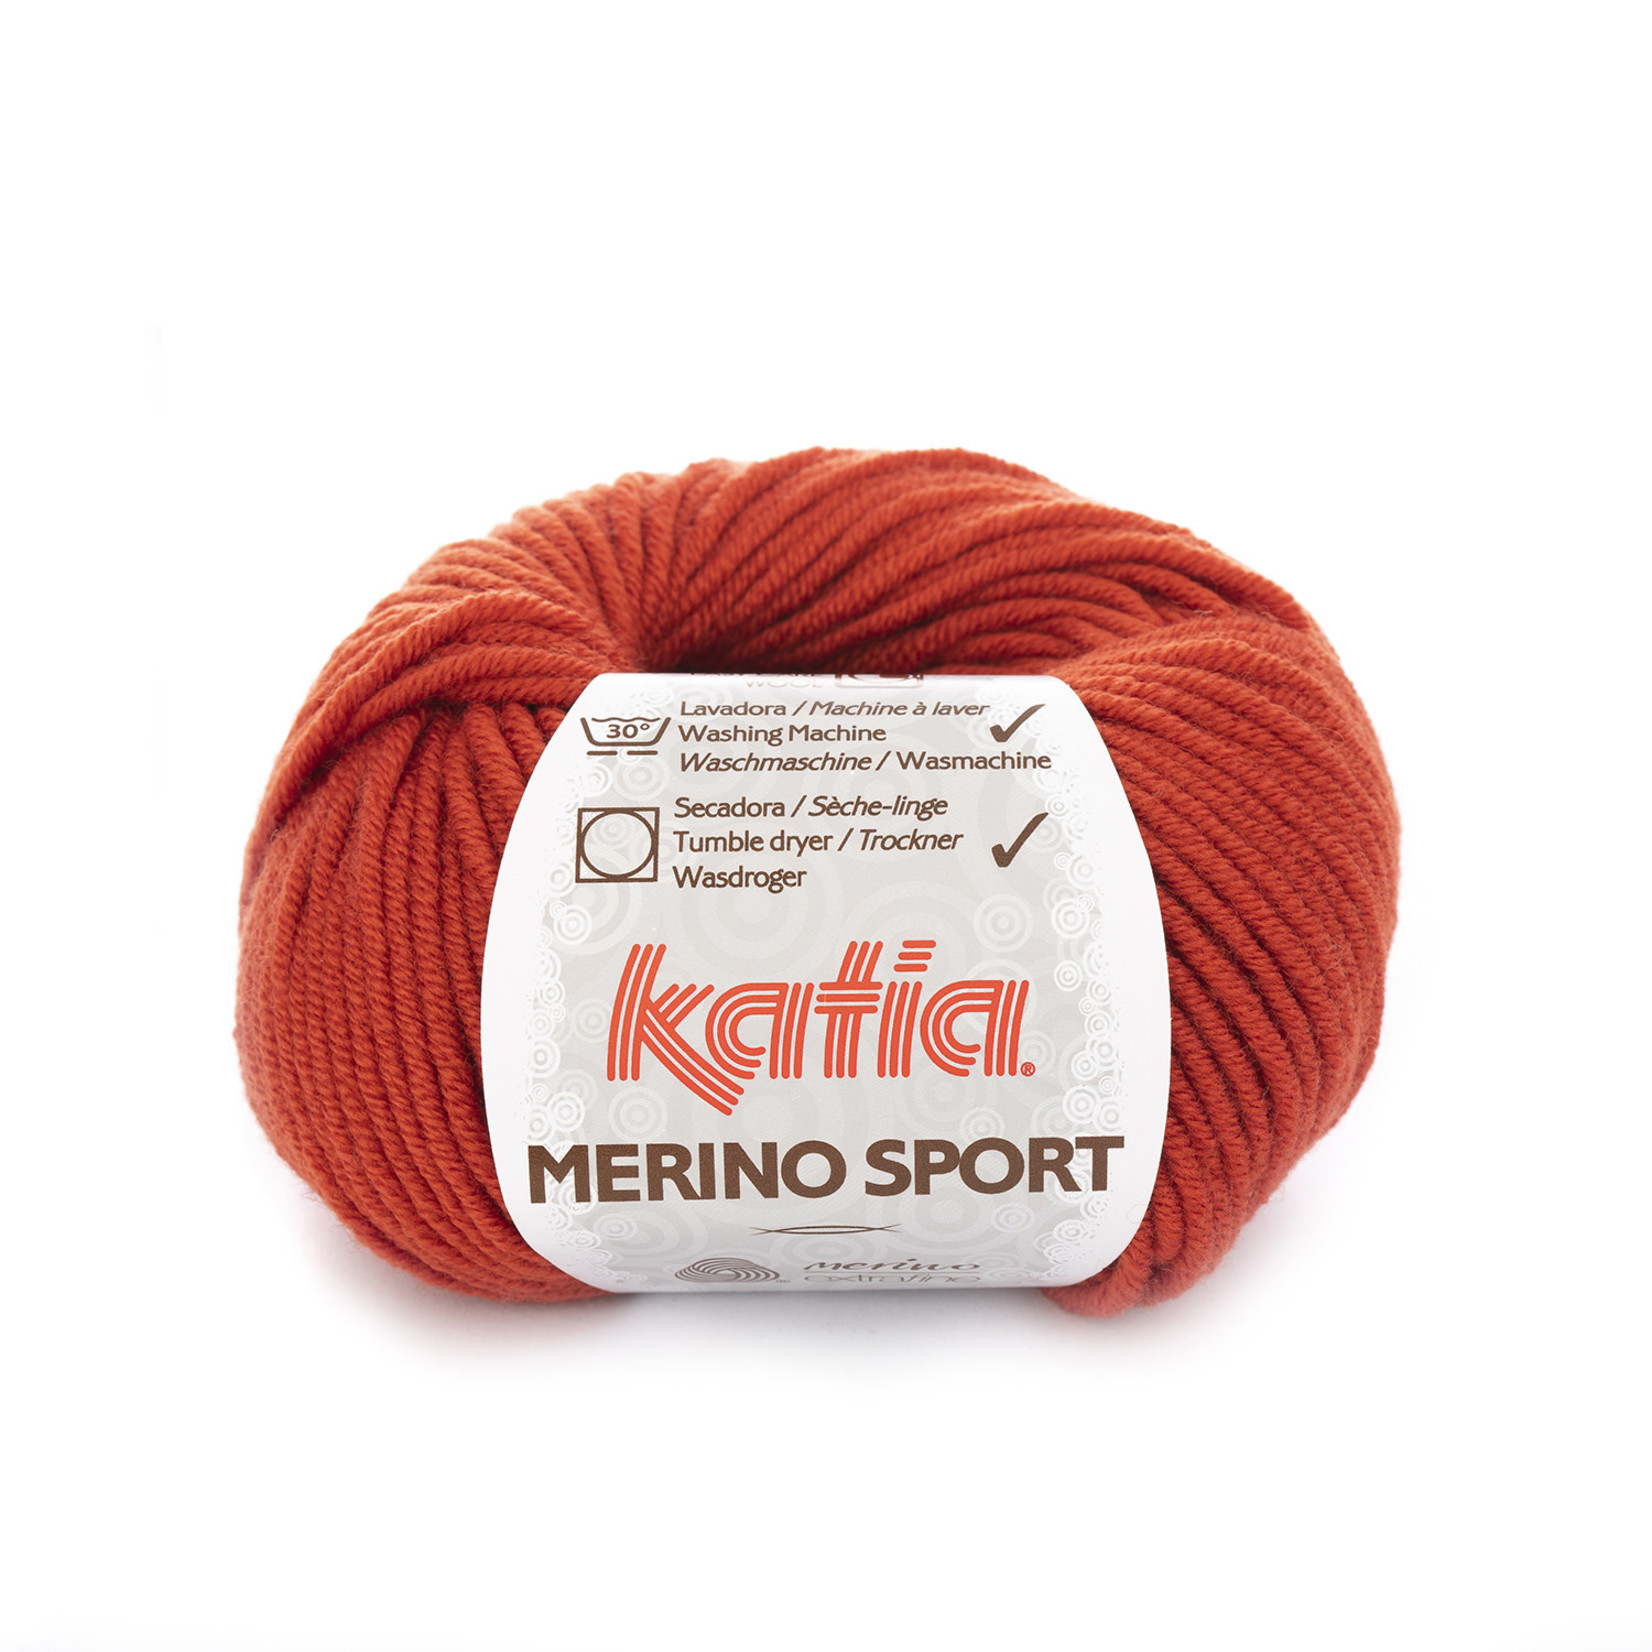 Katia Katia - Merino Sport - 20 Roestbruin - 50 gr.